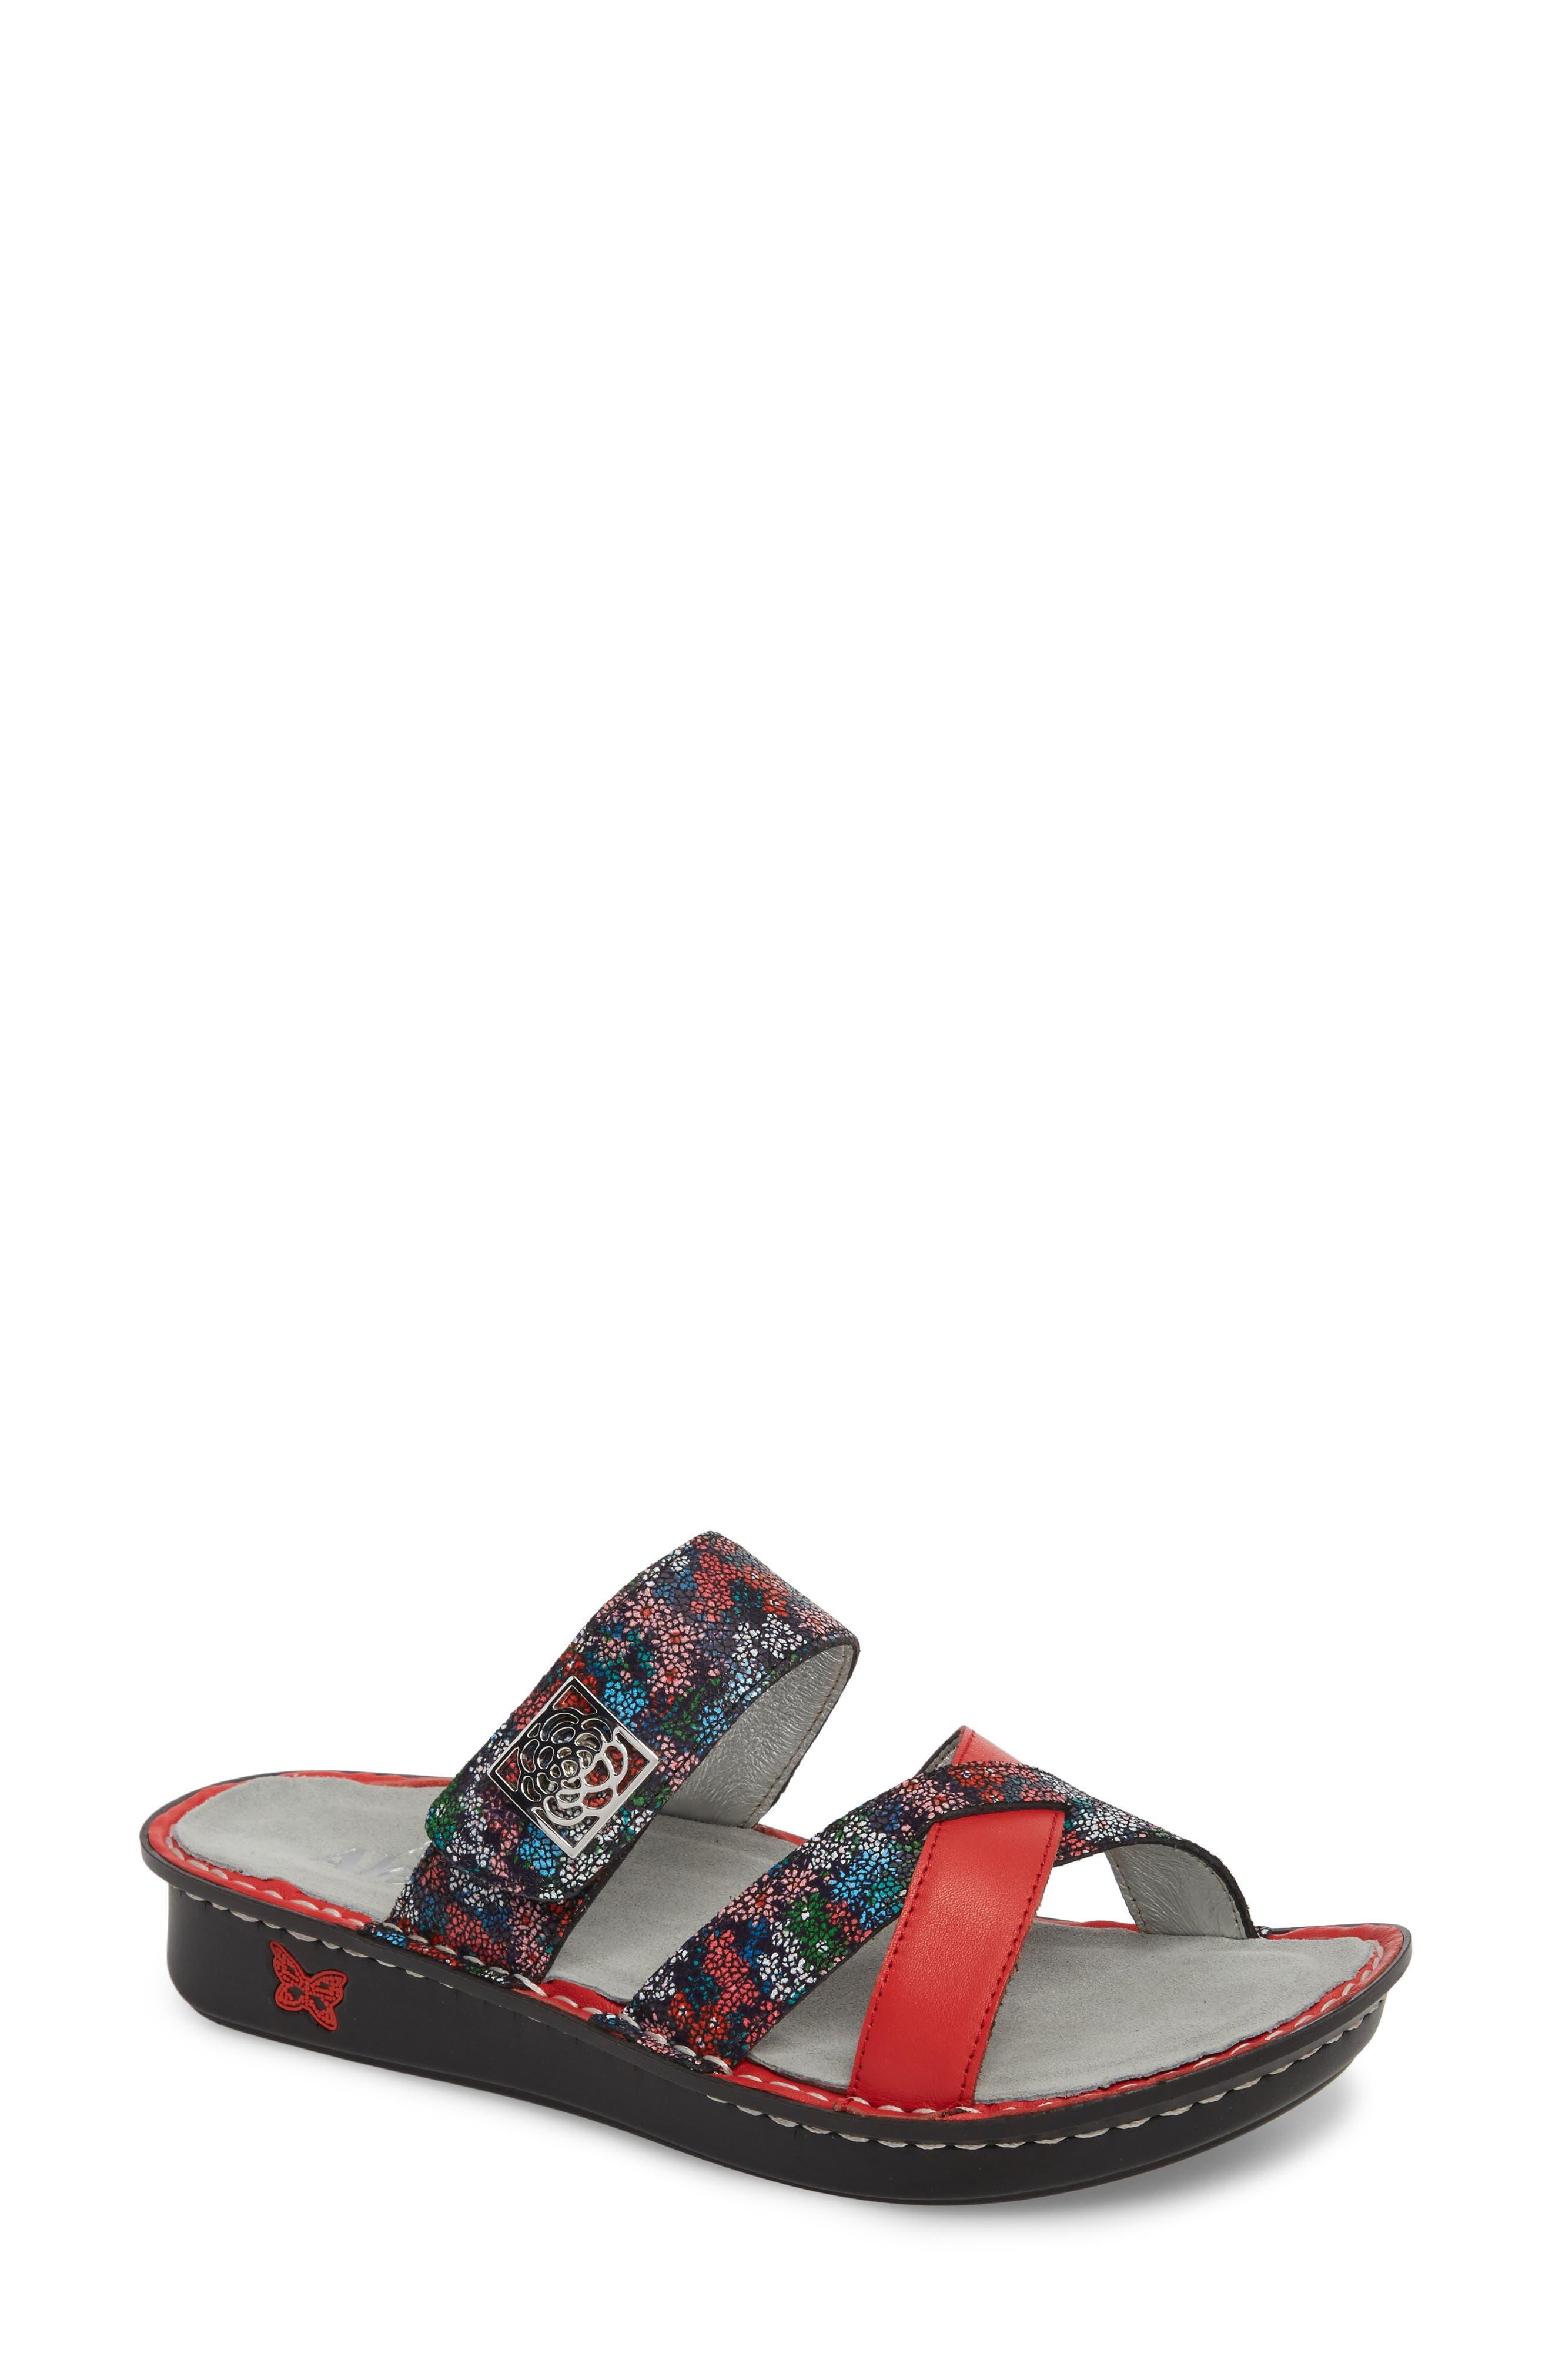 ALEGRIA by PG Lite Victoriah Slide Sandal, Main, color, BOTANICOOL LEATHER